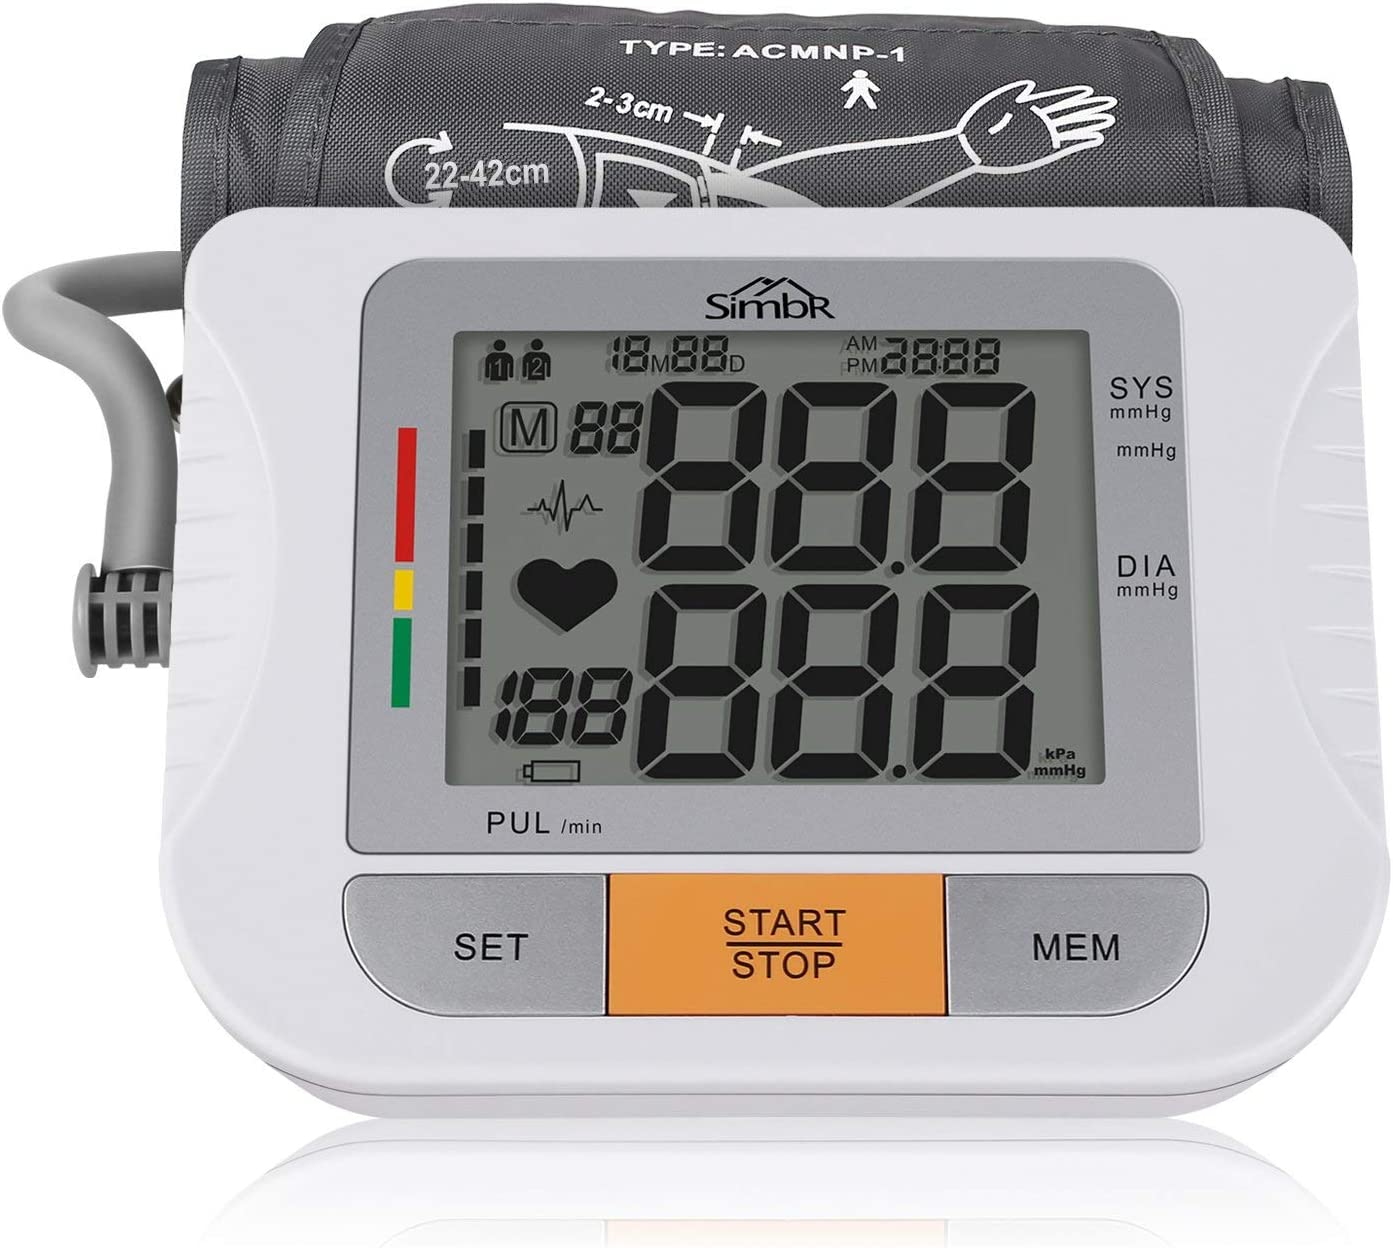 SIMBR Tensiómetro de Brazo Digital Monitor de Presión Arterial con Memoria (2 * 90) Certificada por FDA CE ROHS con Manguito Largo de 22-42cm